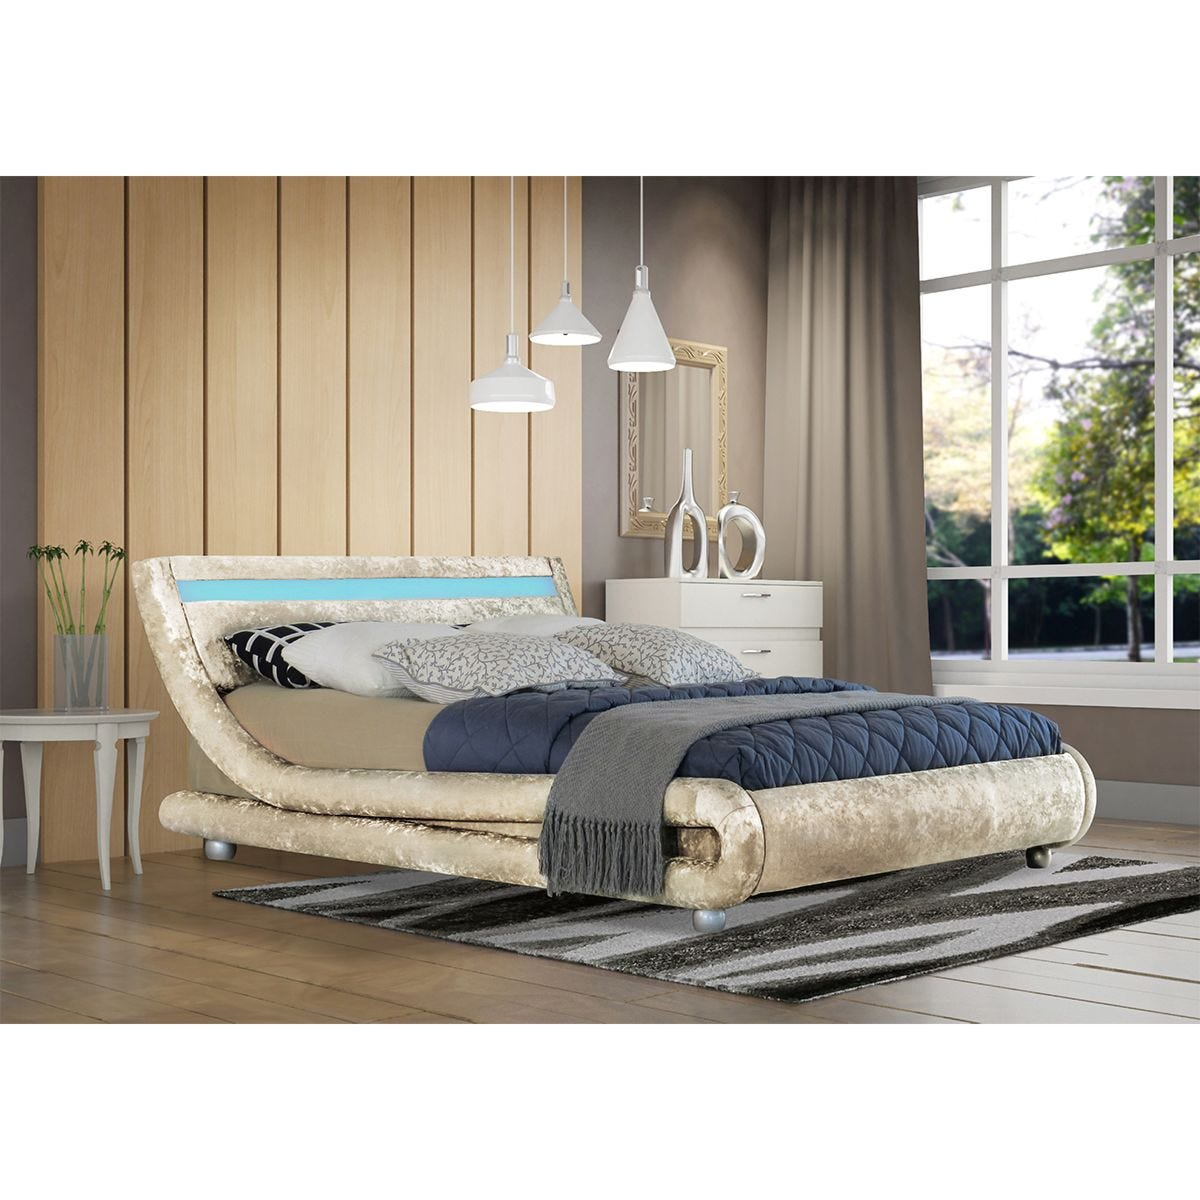 Elias LED King Bed Frame - Cream